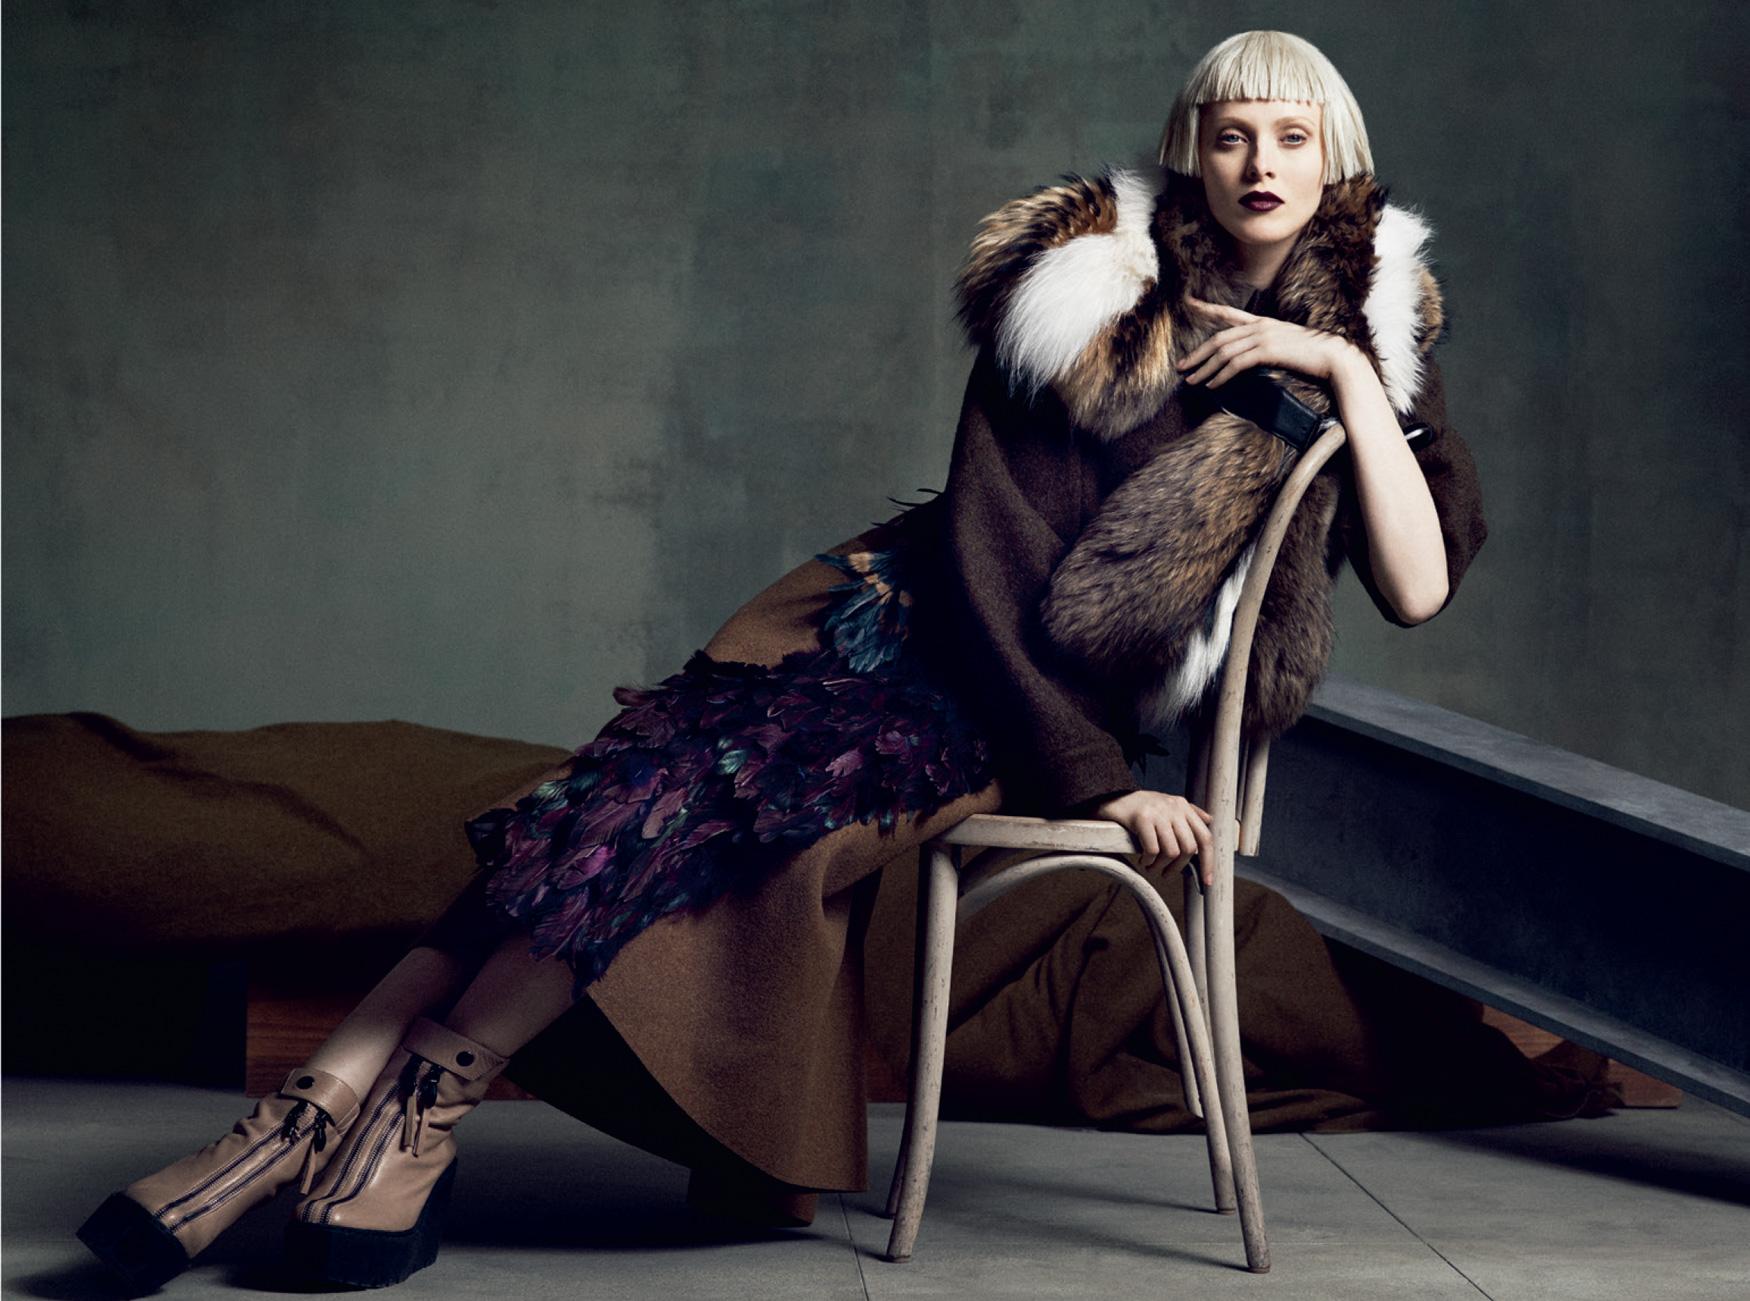 Giovanna-Battaglia-The-Icons-Of-Perfections-Vogue-Japan-15th-Anniversary-Issue-Luigi-Iango-V181_264_200-4.jpg